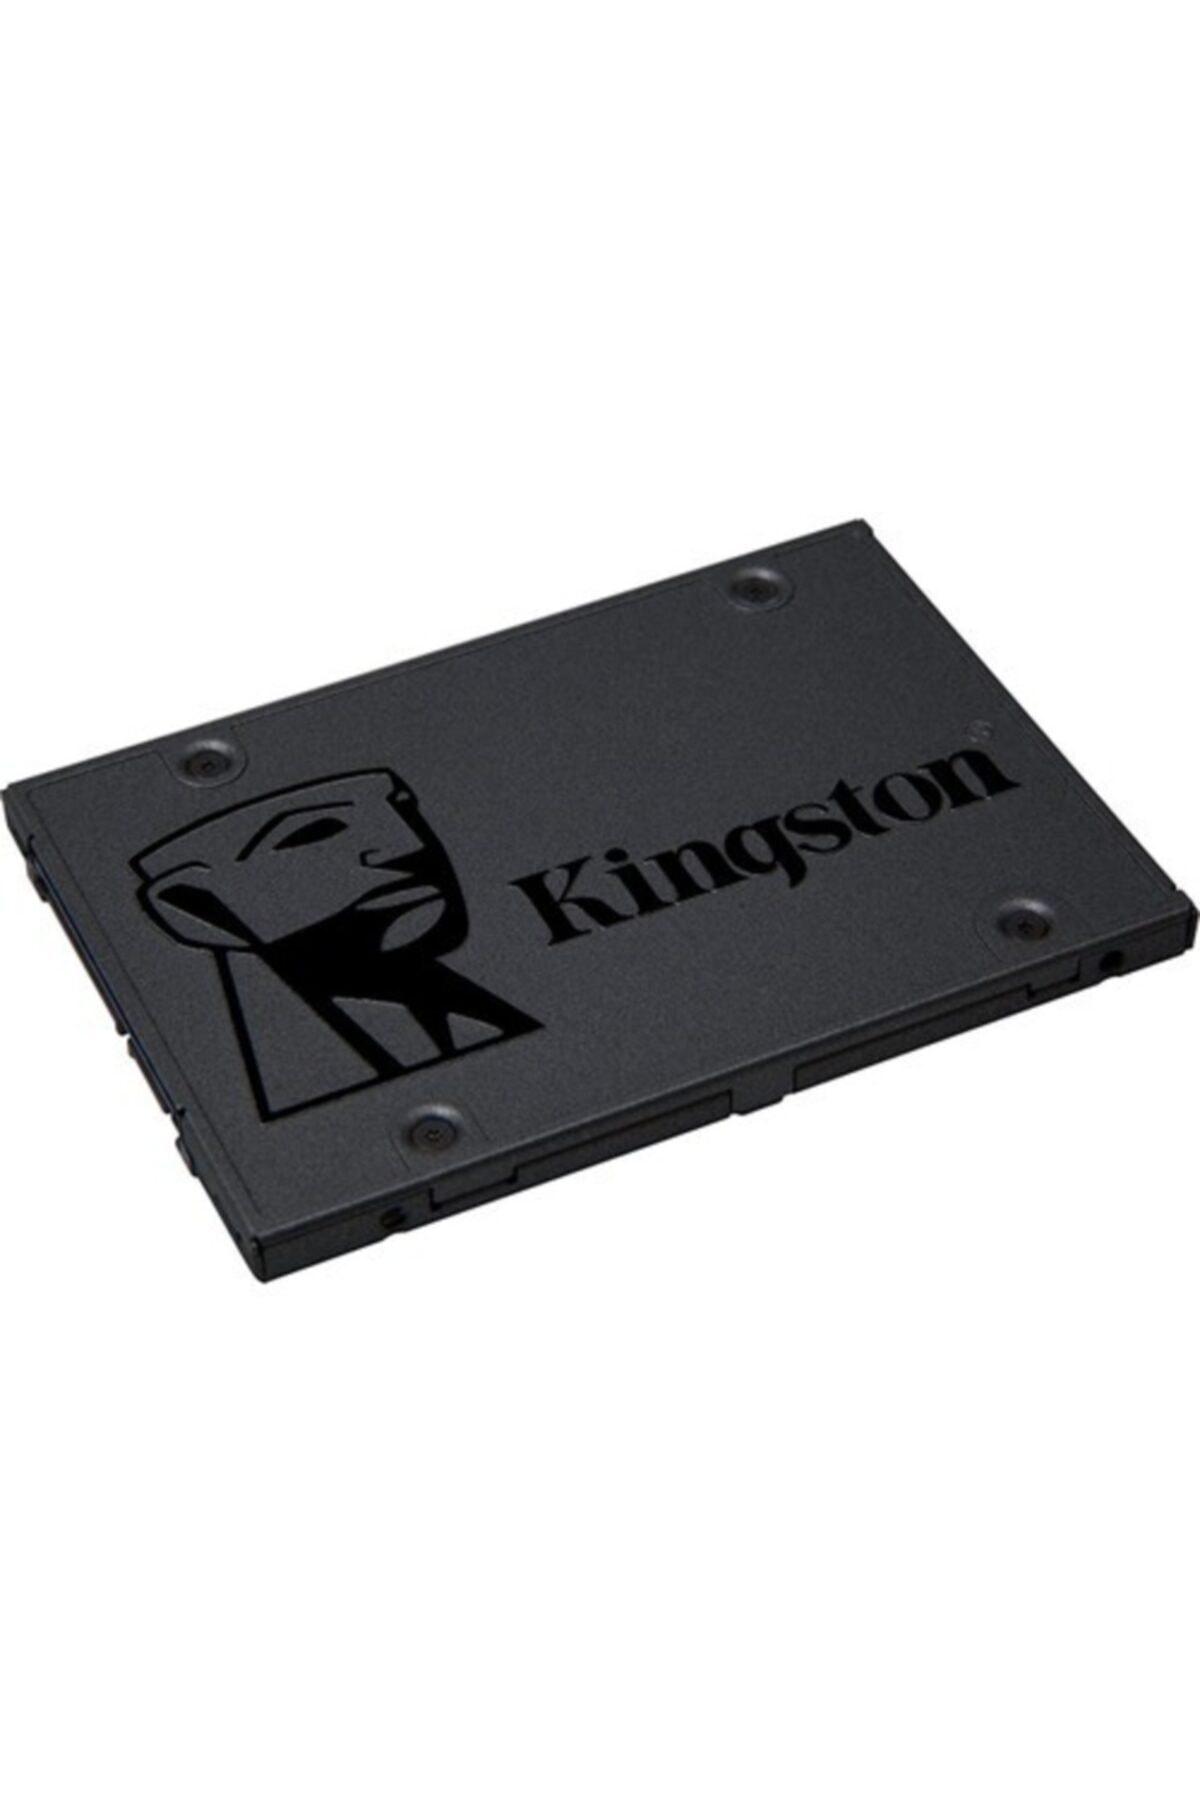 Kingston A400 Ssd 240gb 500mb-350mb/s Sata3 Ssd (Sa400s37/240g) 2